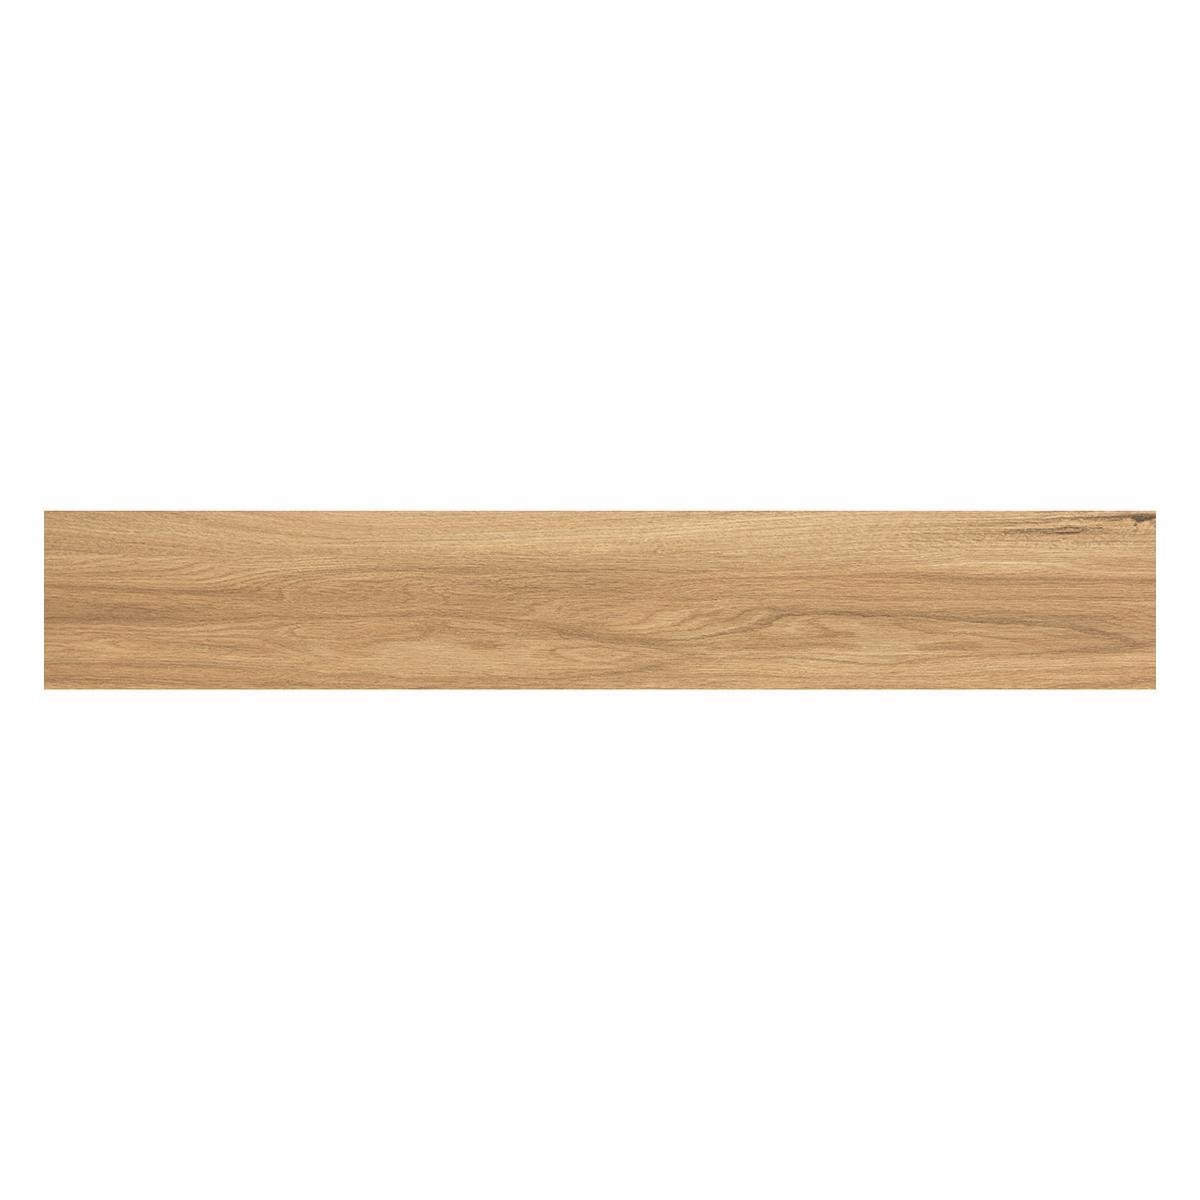 Piso Laminado Urban Roble Walnut Mate - 19.9X121.5 - 2.90 m2